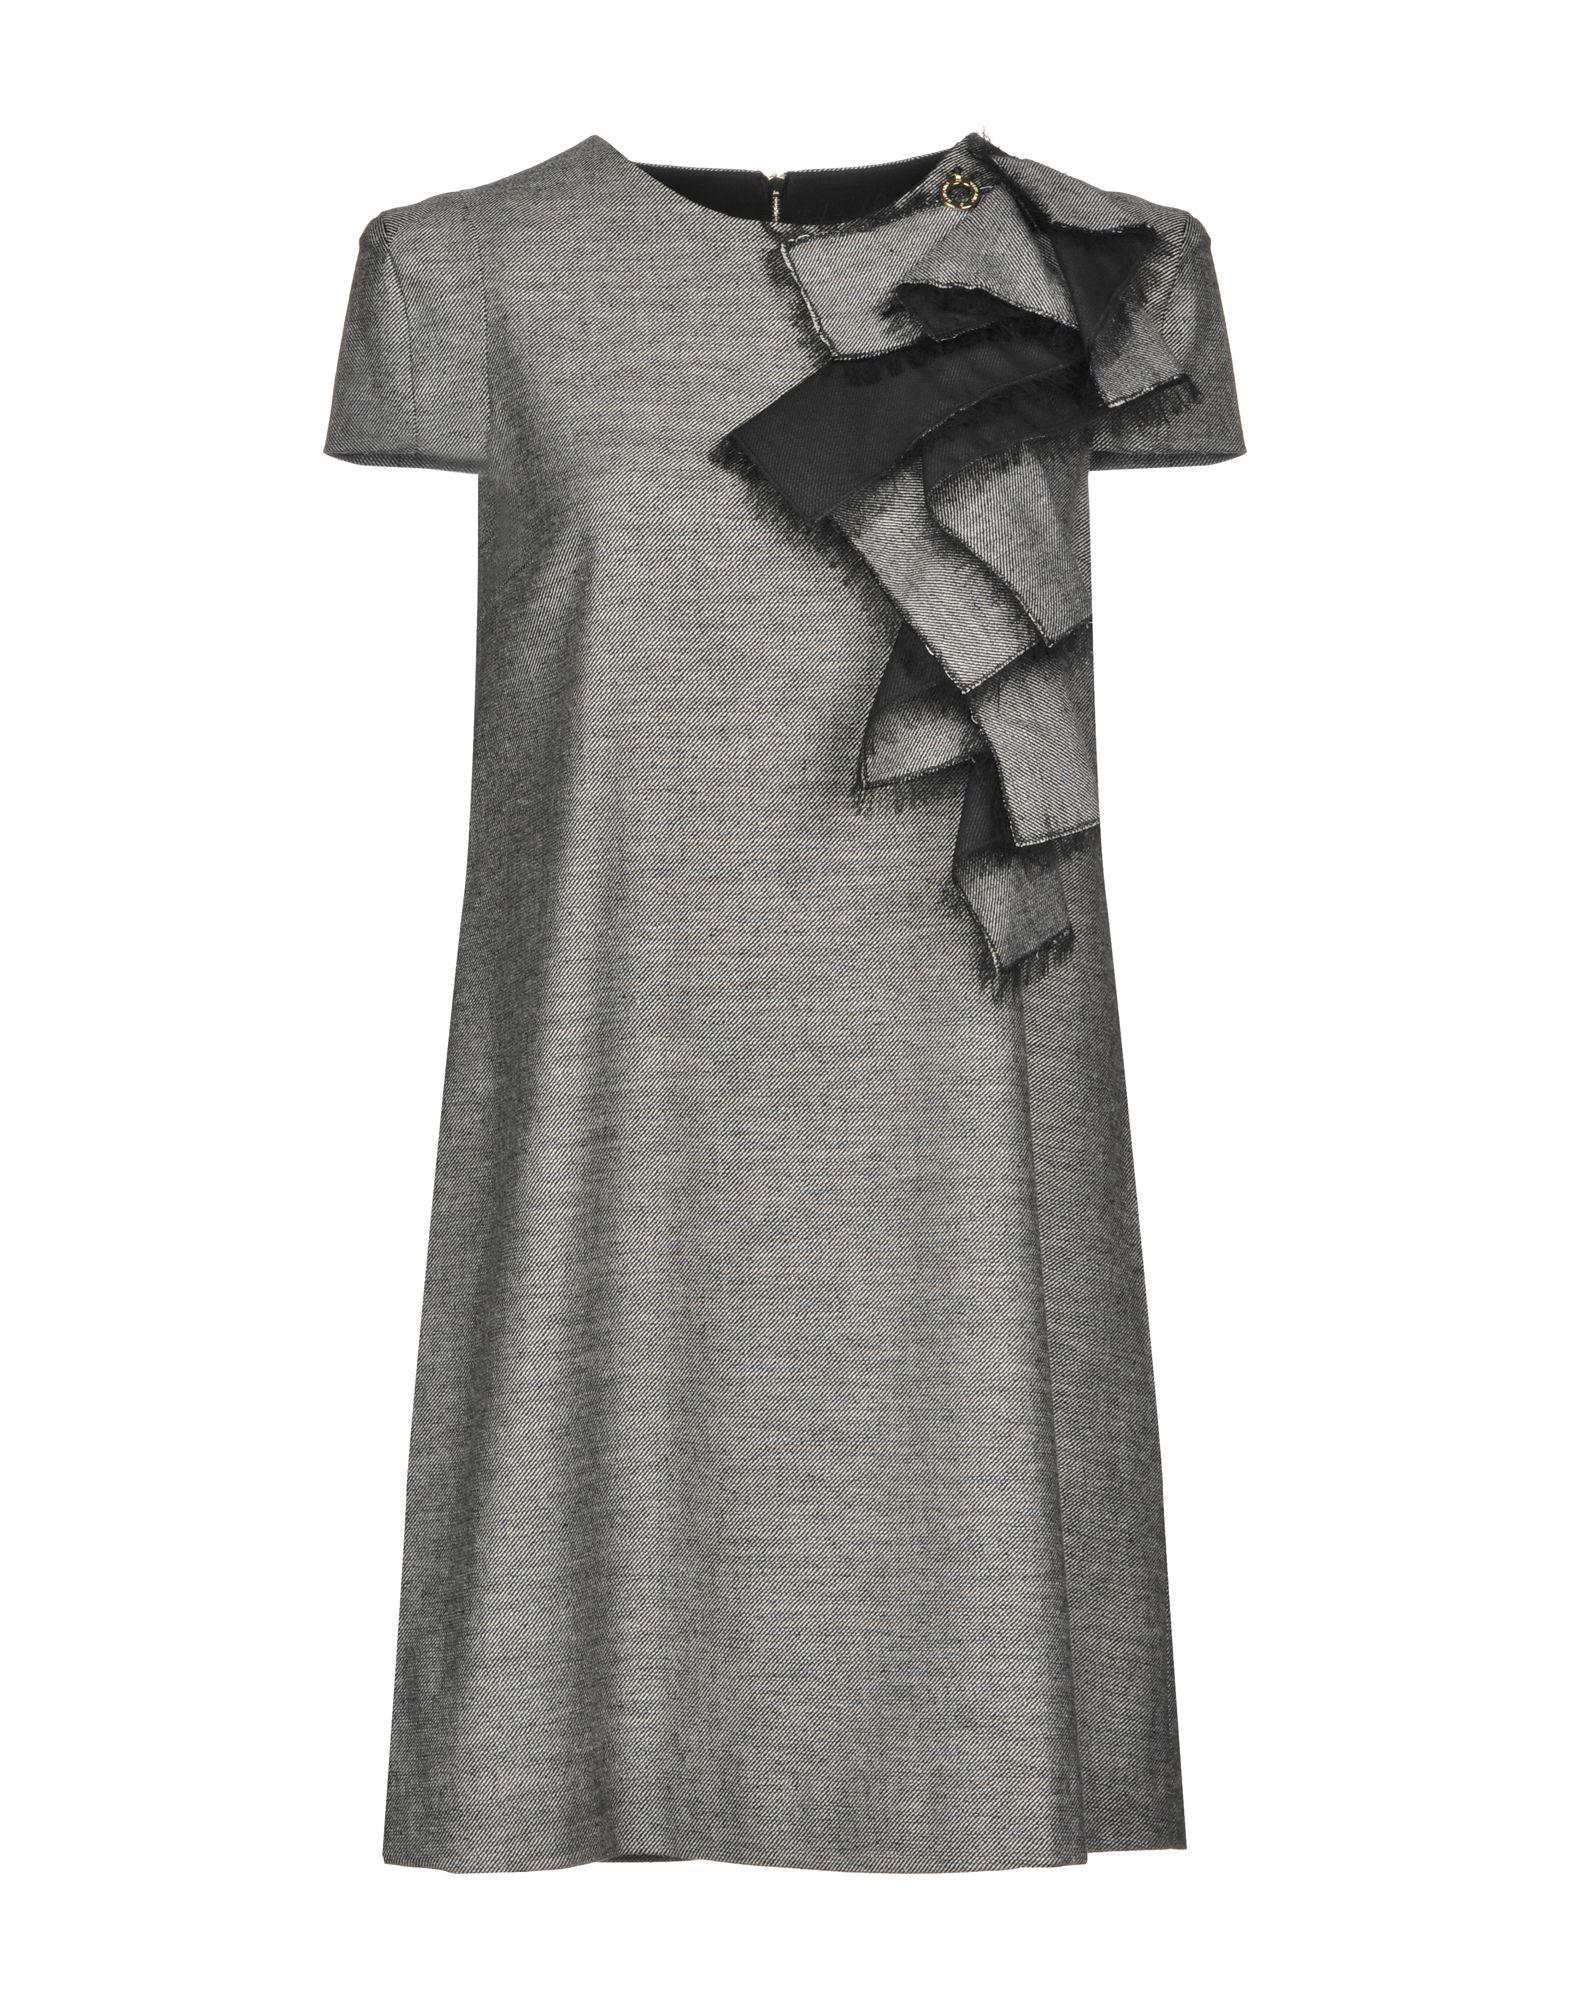 MANGANO Short Dress in Grey